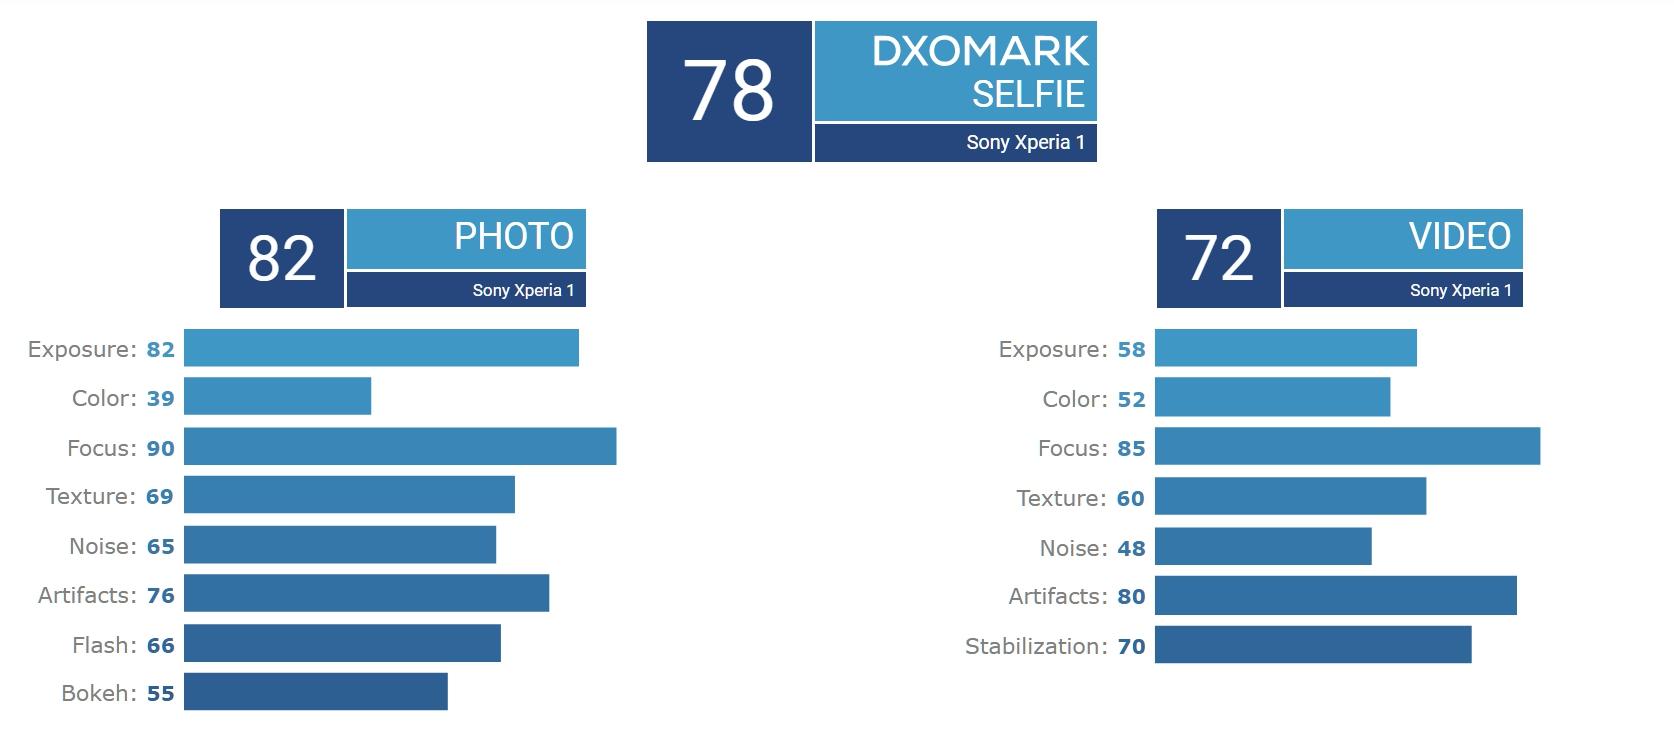 Sony Xperia 1 DxO自拍相機各項細部得分